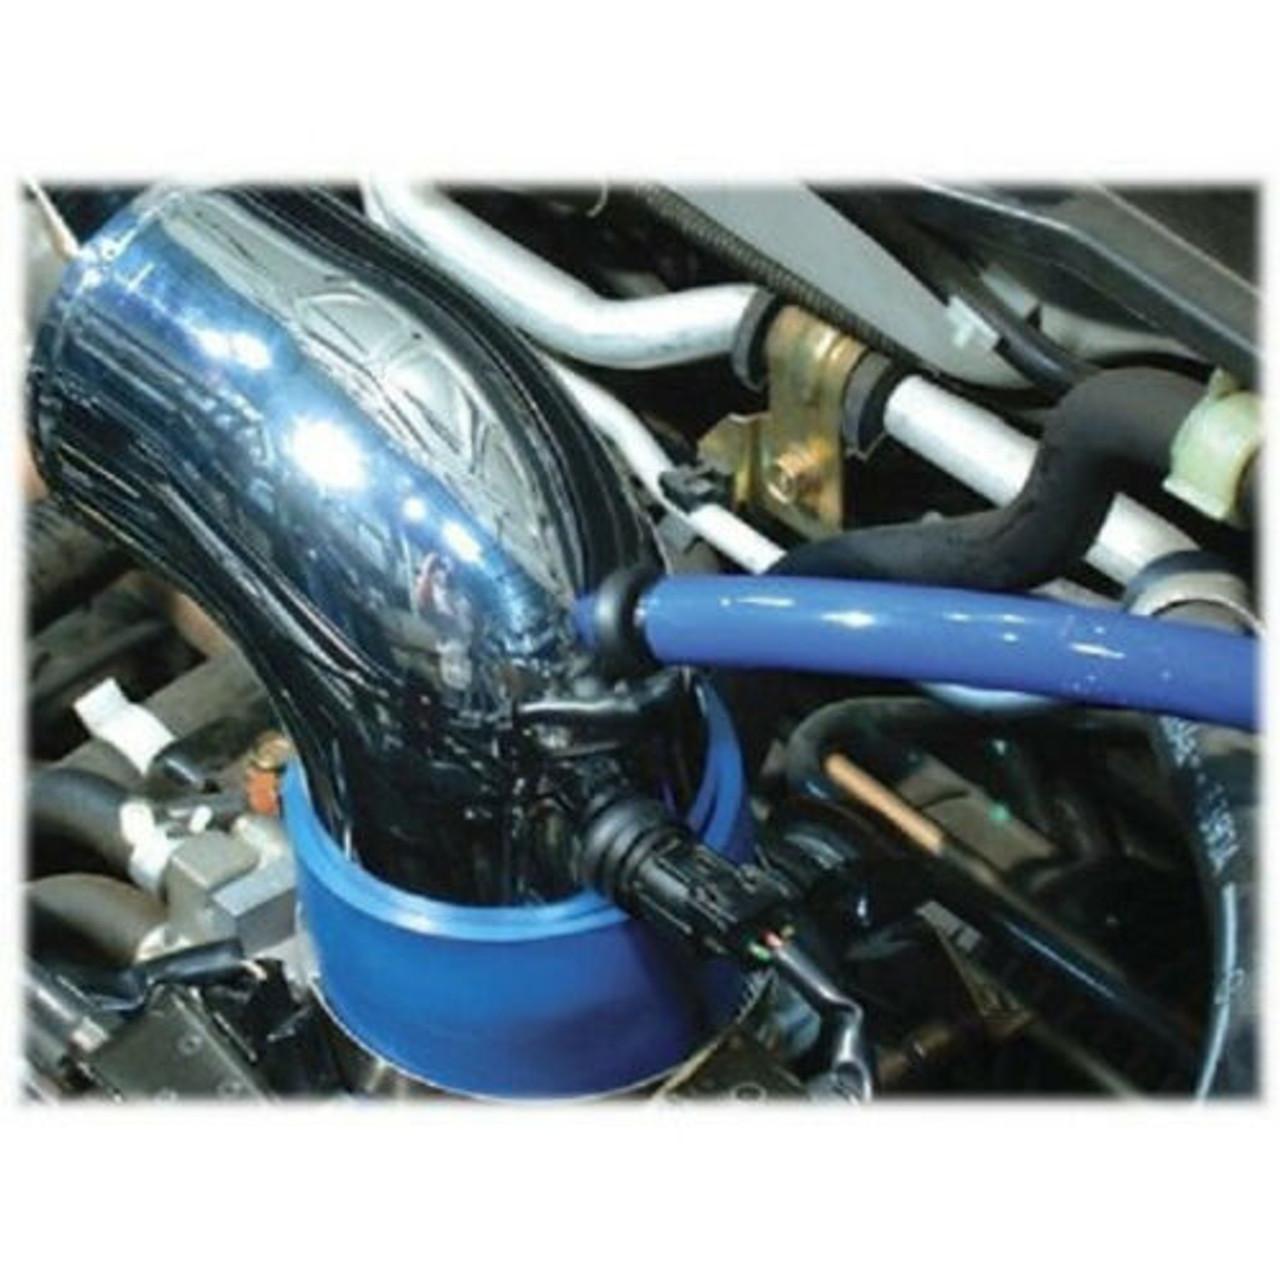 "Details about  Universal 3"" Diameter Carbon Fiber Short Ram Air Intake with Sensor Adapter Kit"